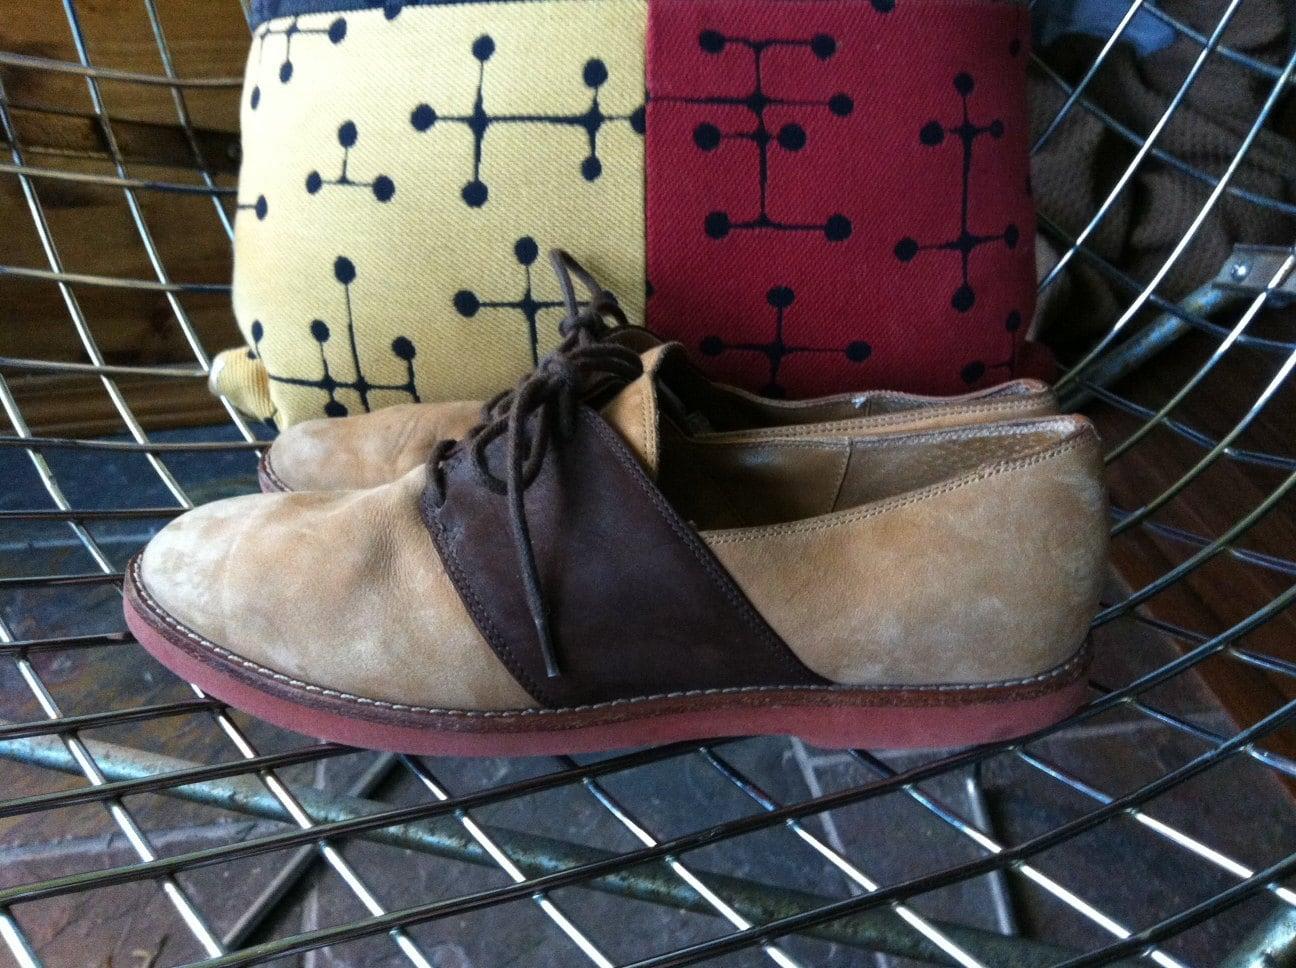 Vintage 9 Nine West Saddle Shoes Women's Size 6/7 Suede